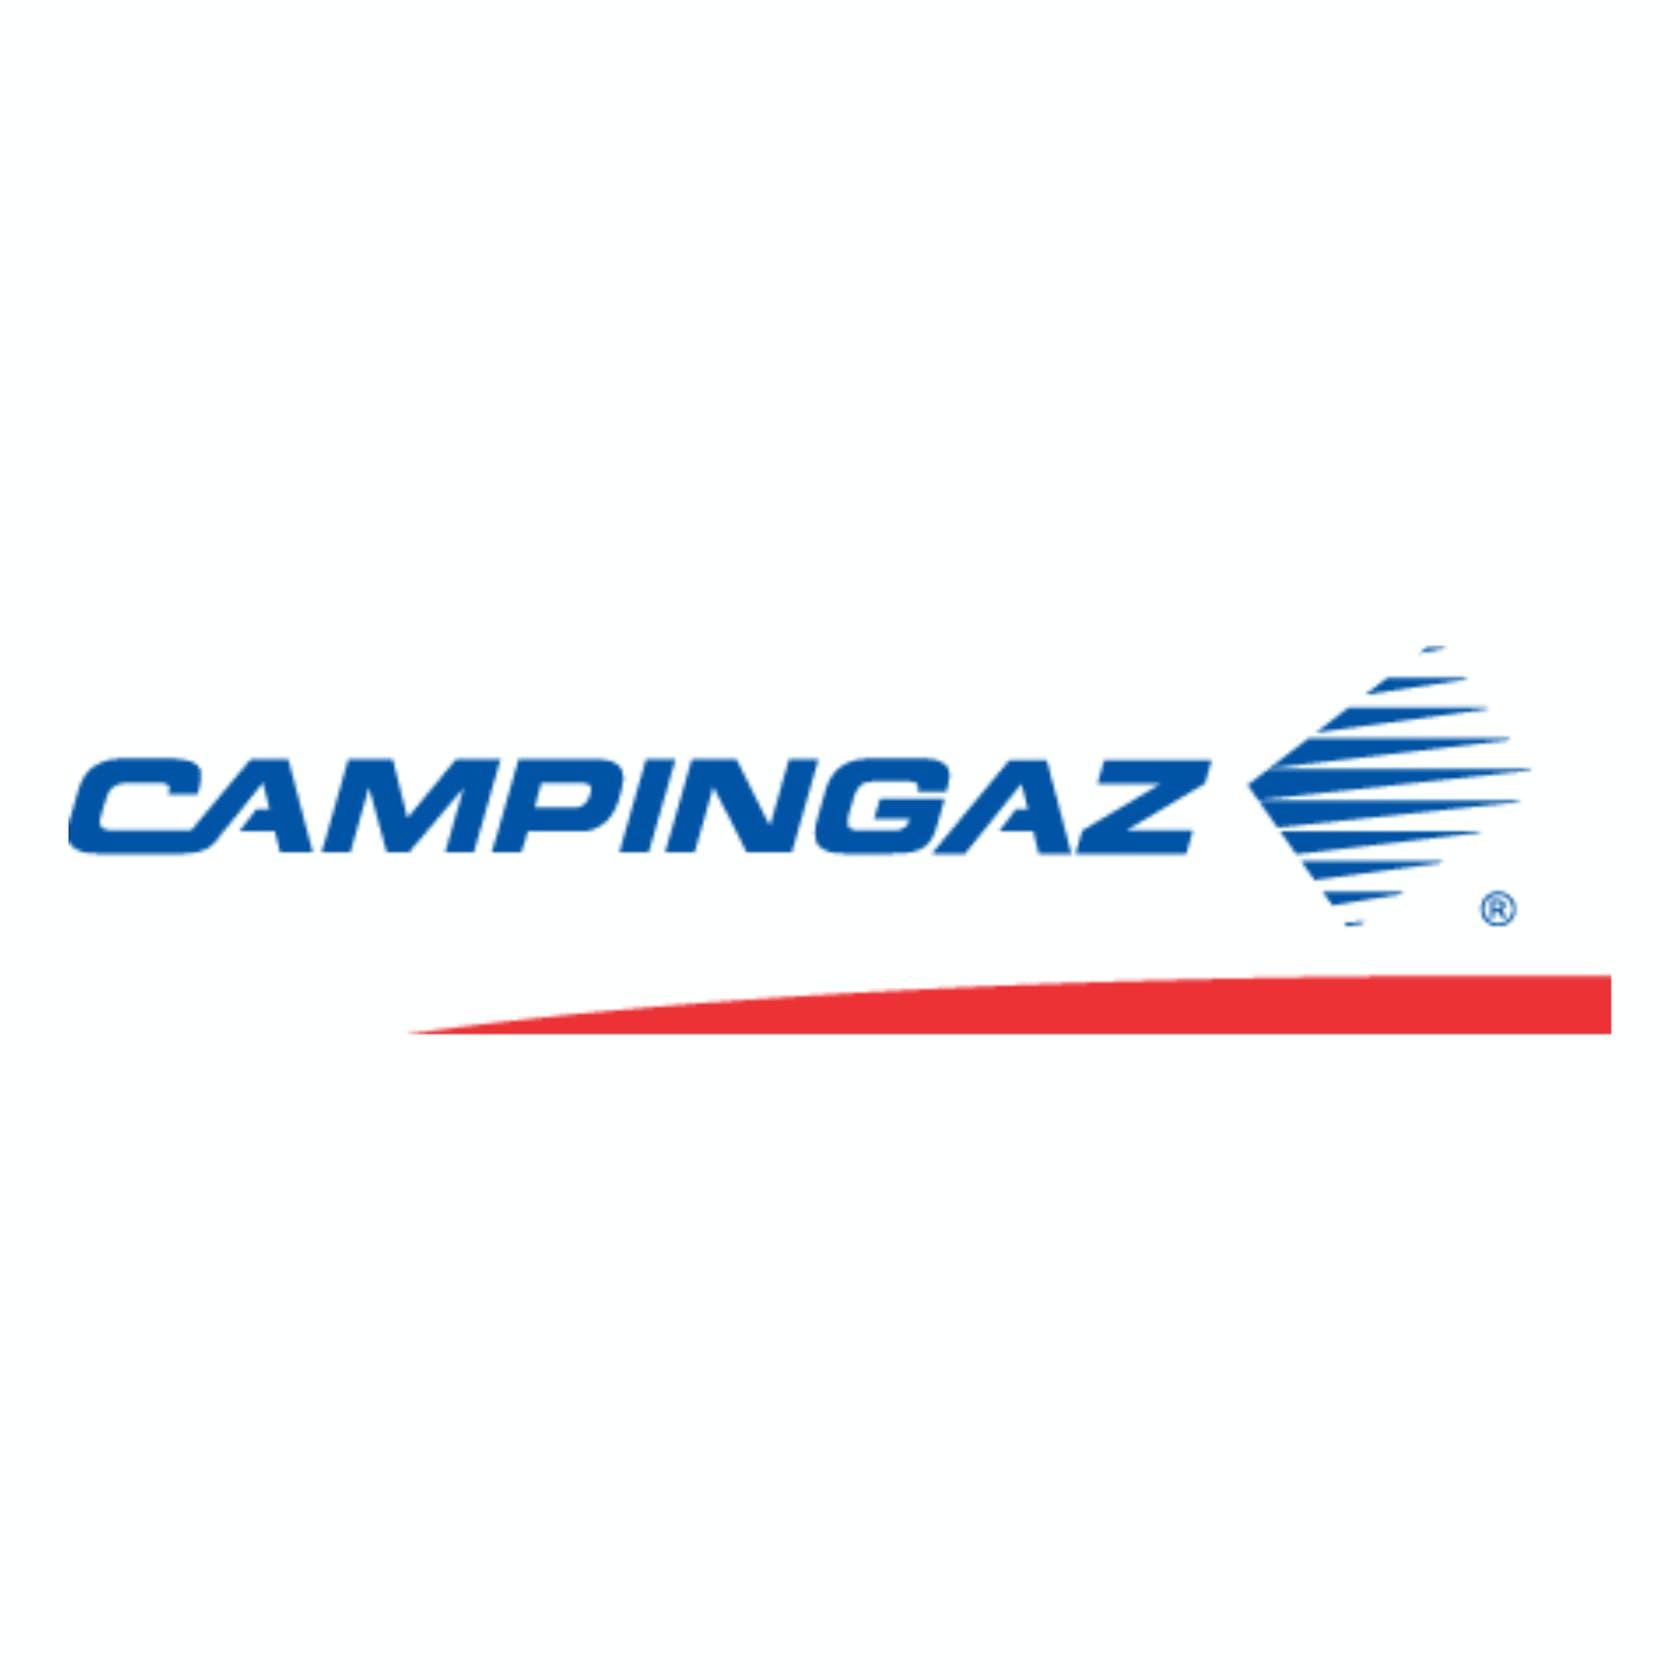 Campingaz onlineshop